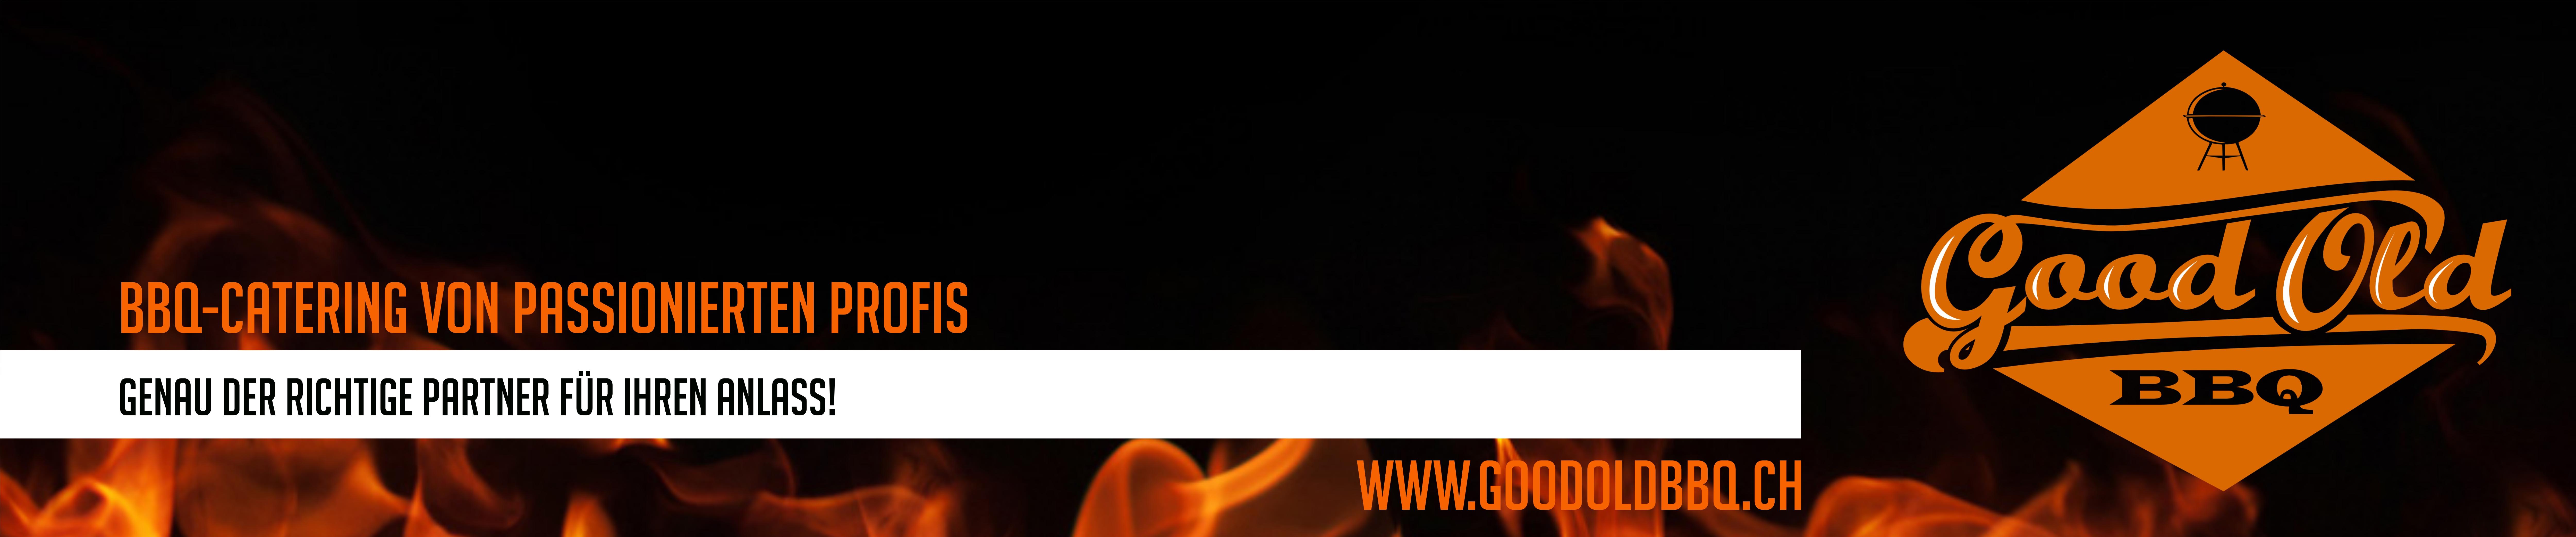 Slide_GOBBQ_V2-Seite001